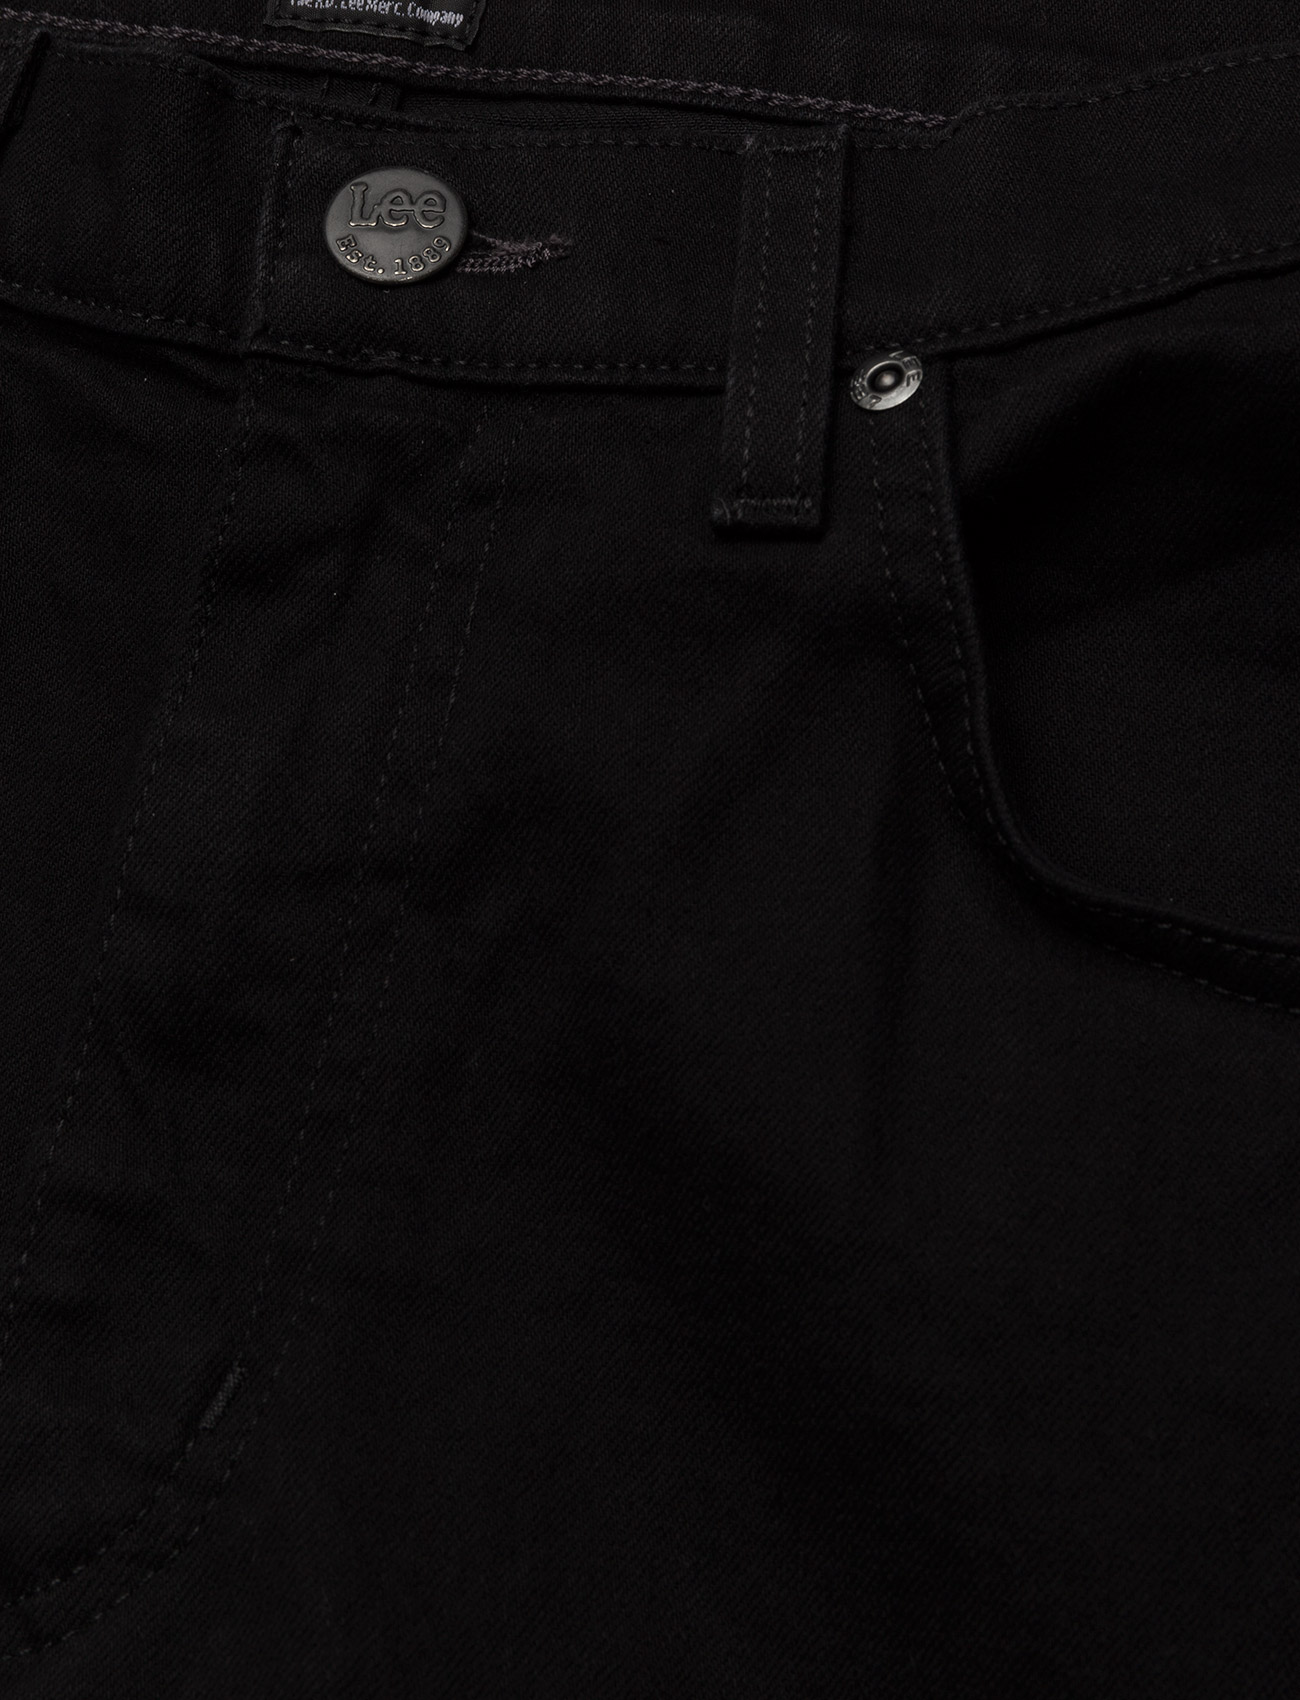 Brooklyn Clean Blackclean BlackLee Straight Jeans c4AL35Rjq